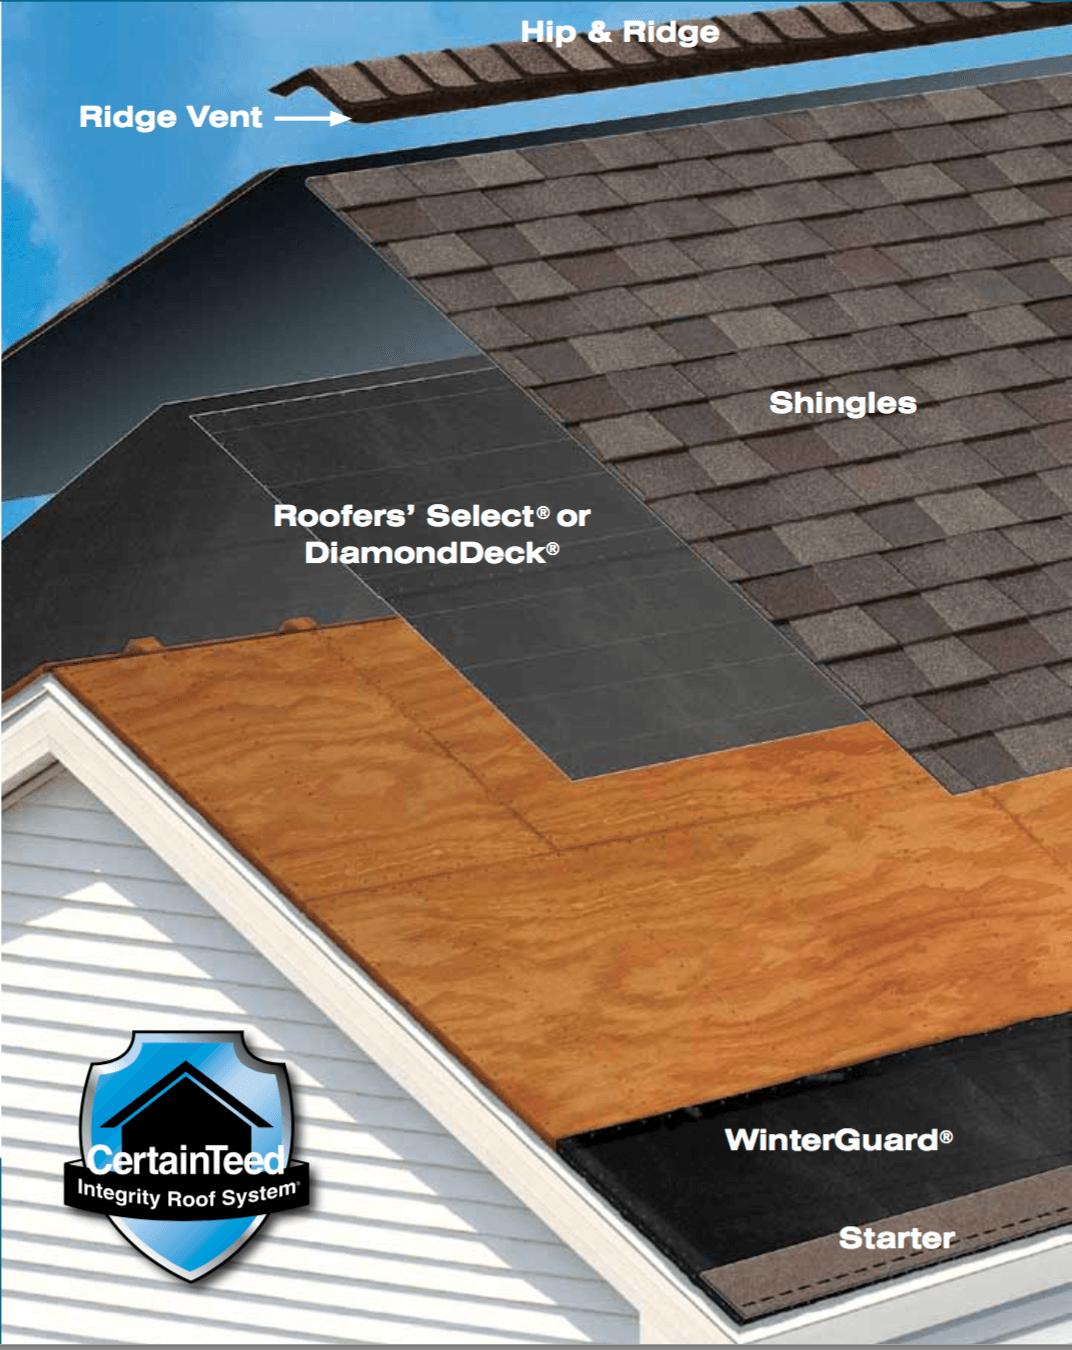 Roof cutaway: starter, winterguard, diamonddeck, shingles, ridge vent, hip & ridge